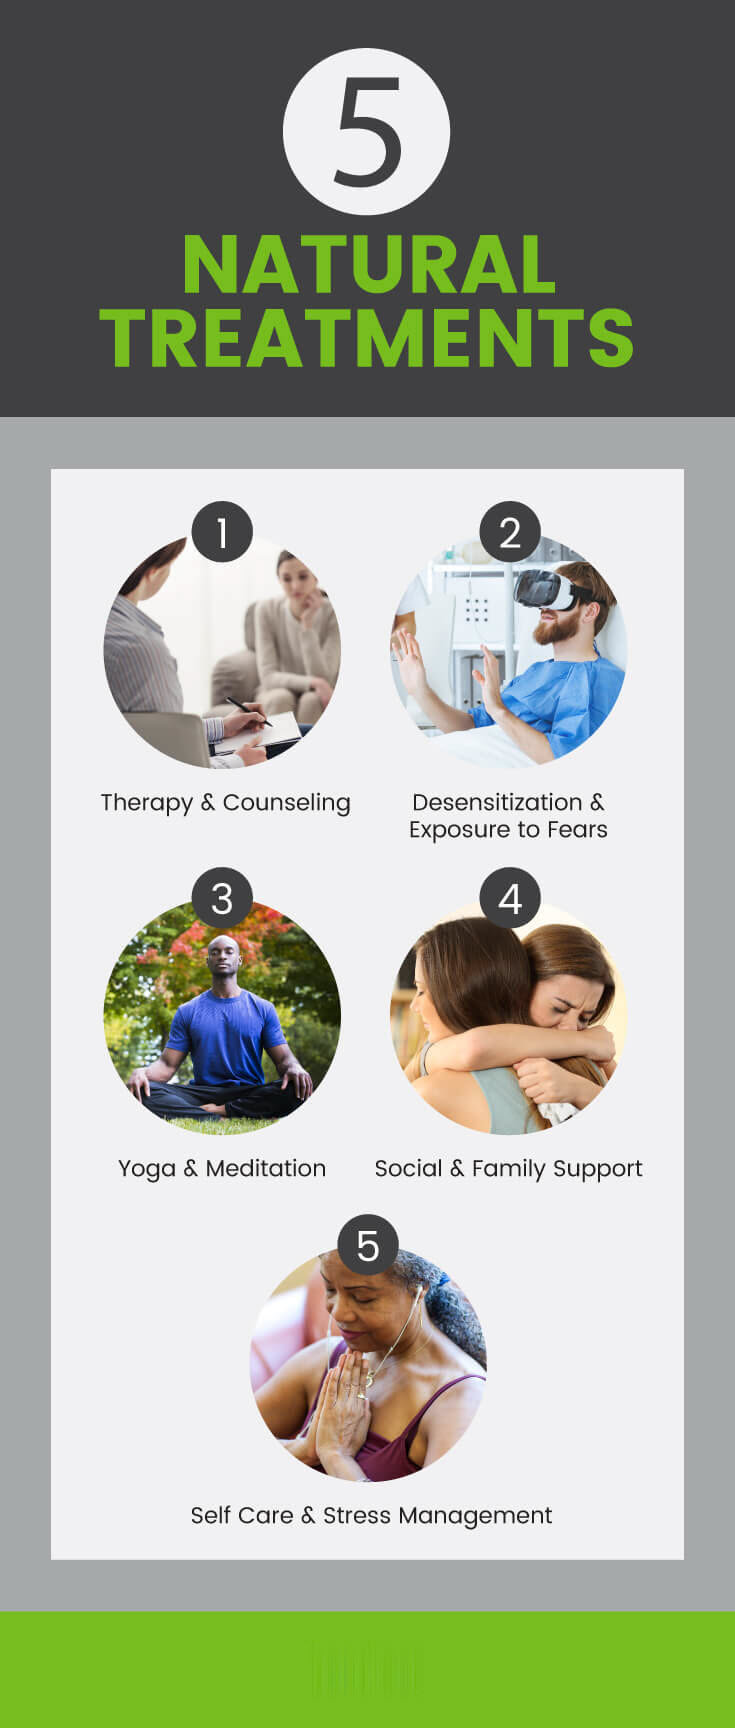 5 natural treatments for PTSD symptoms - MKexpress.net